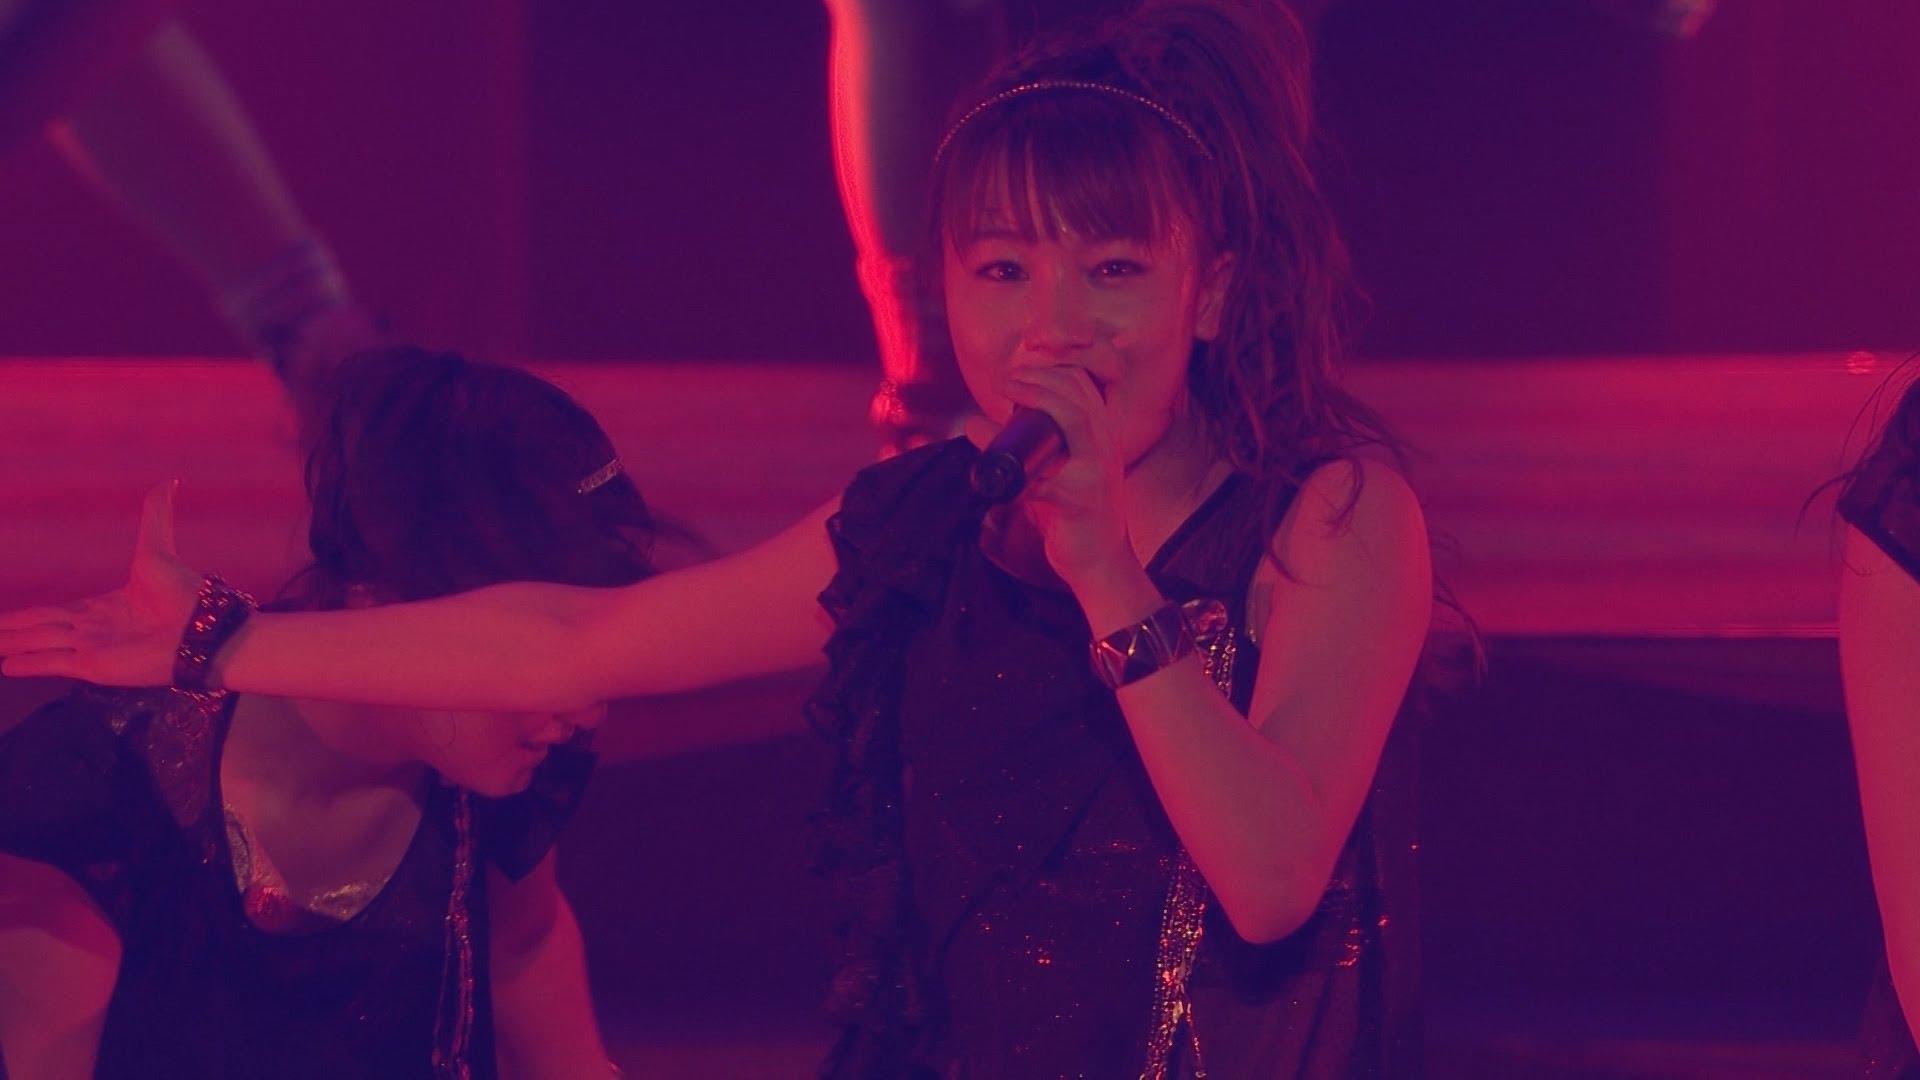 Berryz新曲Dance Shot初公開!、ベリセレ、モー娘。'14、℃-ute、Weekly Smile、生田ヘアアレンジ MC:佐藤優樹【ハロ!ステ#69】